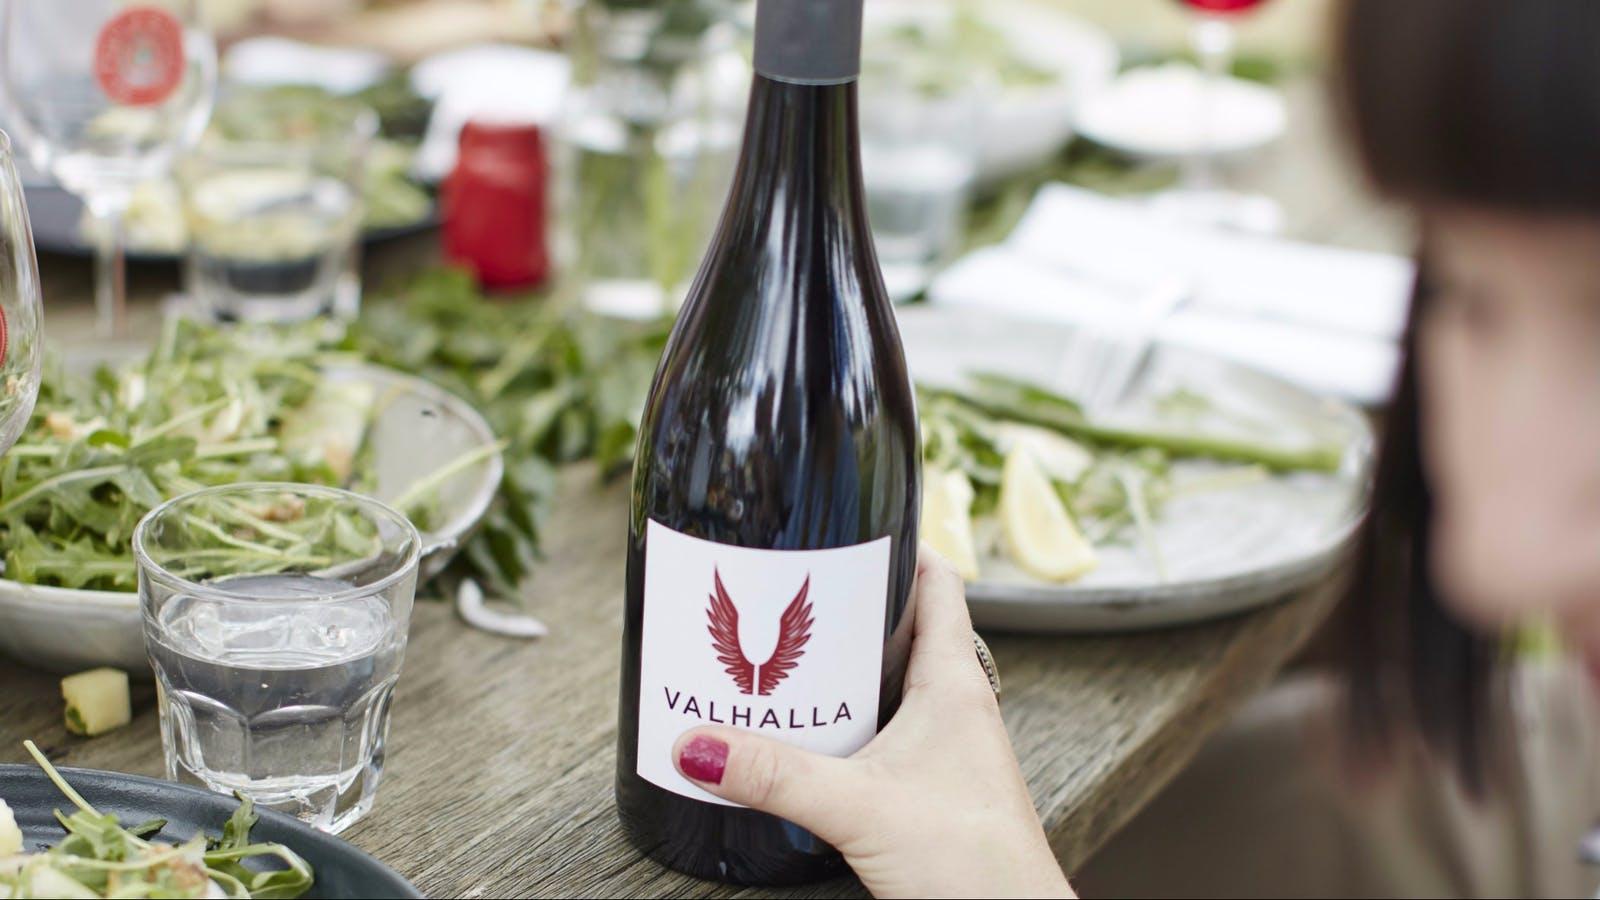 Valhalla bottle with food